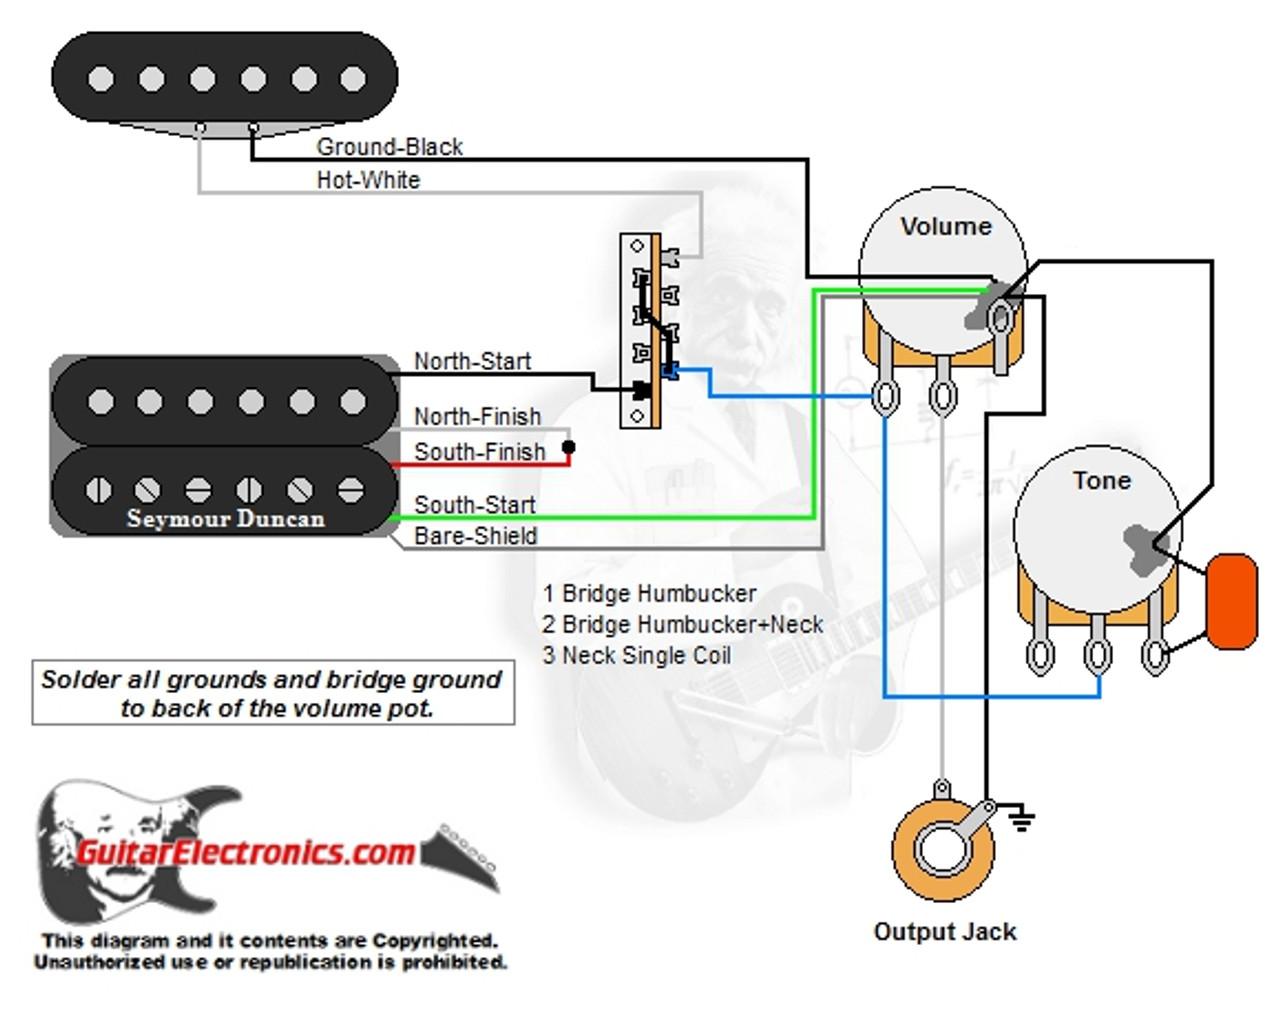 medium resolution of  diagramshumbucker wiring diagrams 1 humbucker 1 single coil 3 way lever switch 1 volume 1 tone 001 humbucker 1